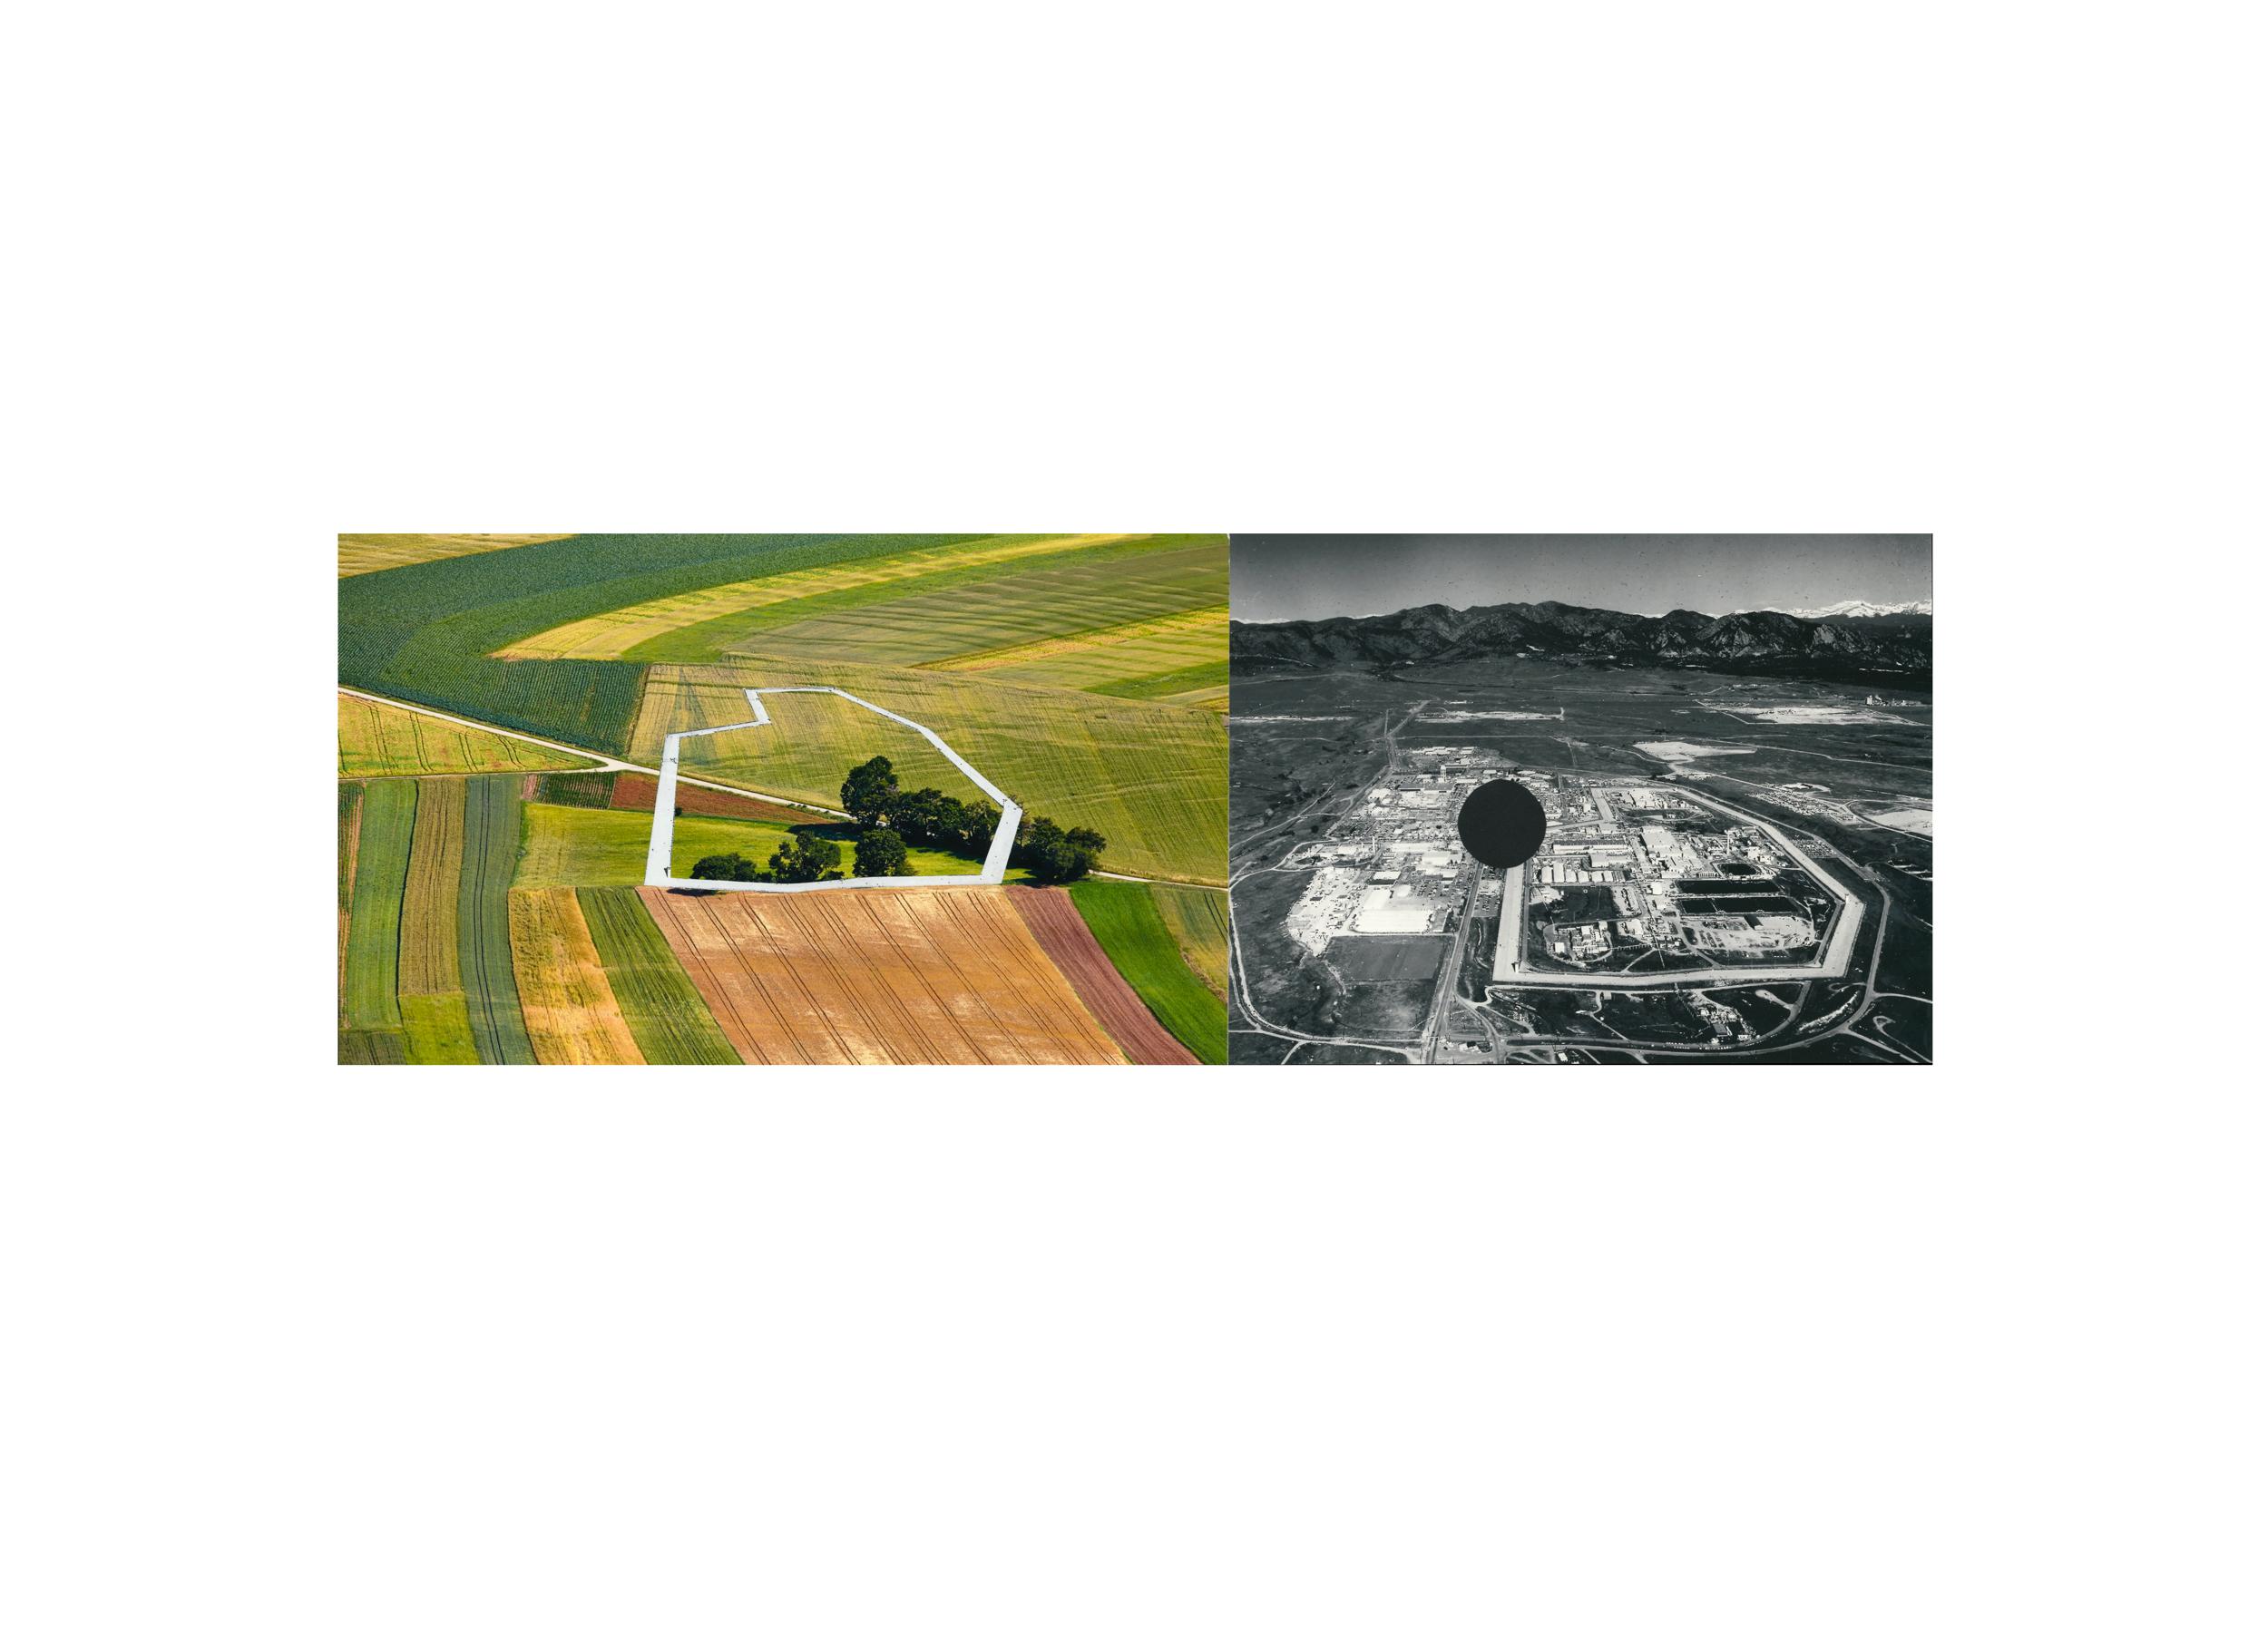 "Aerial Farmland, c ollage, archival pigment print, 23"" x 32"", 2018"